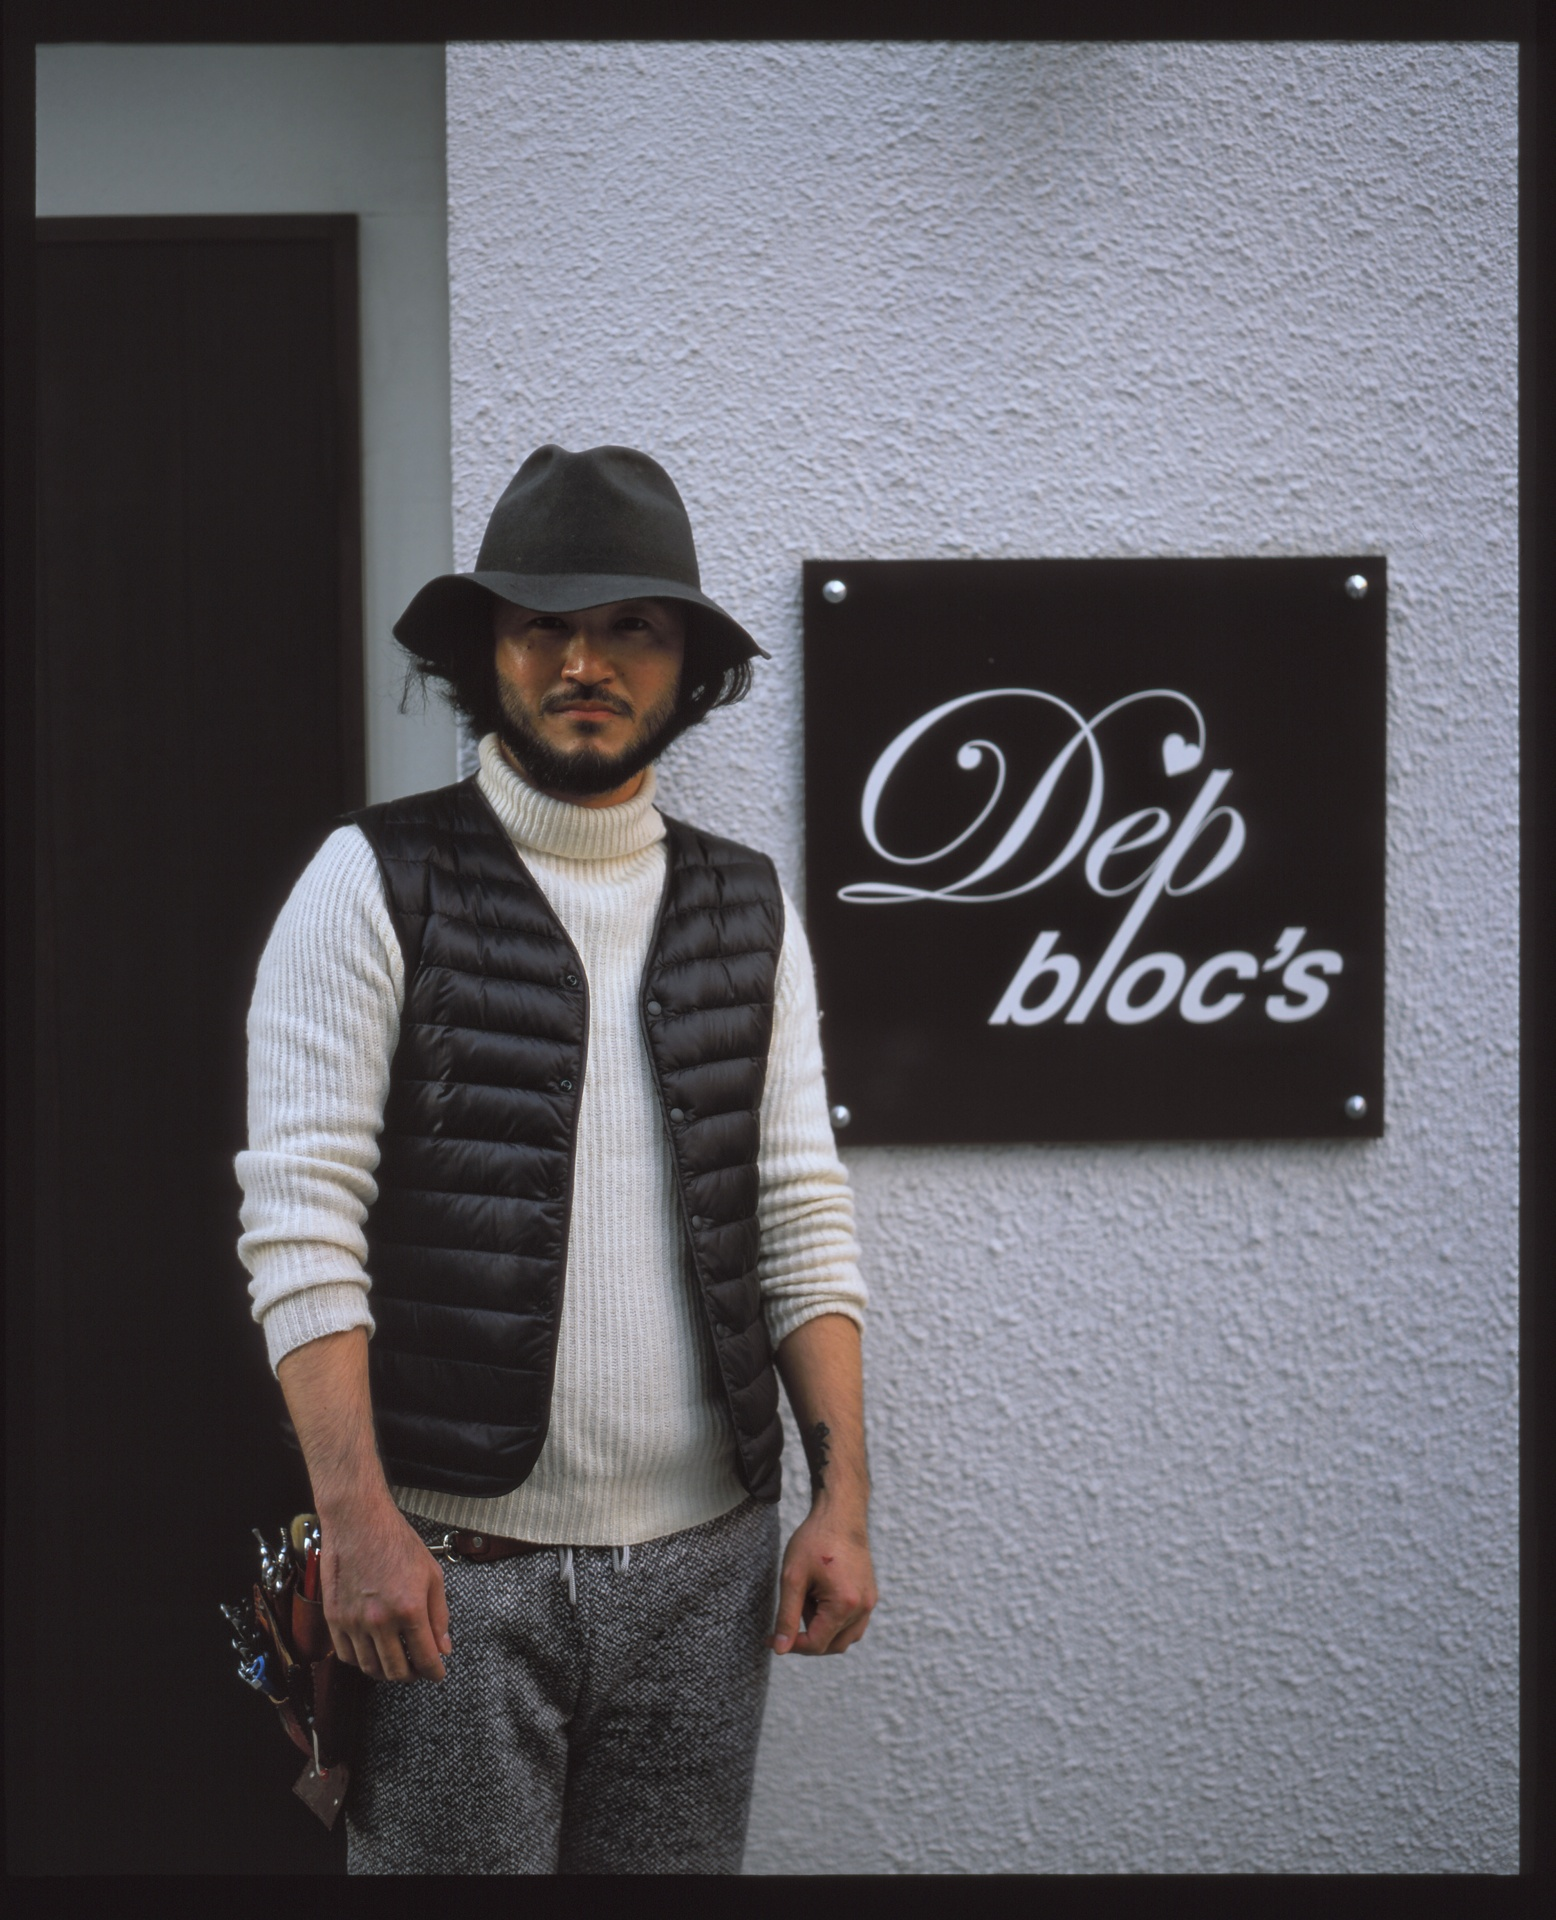 Fukumoto san of Dep bloc's, Fukuoka.